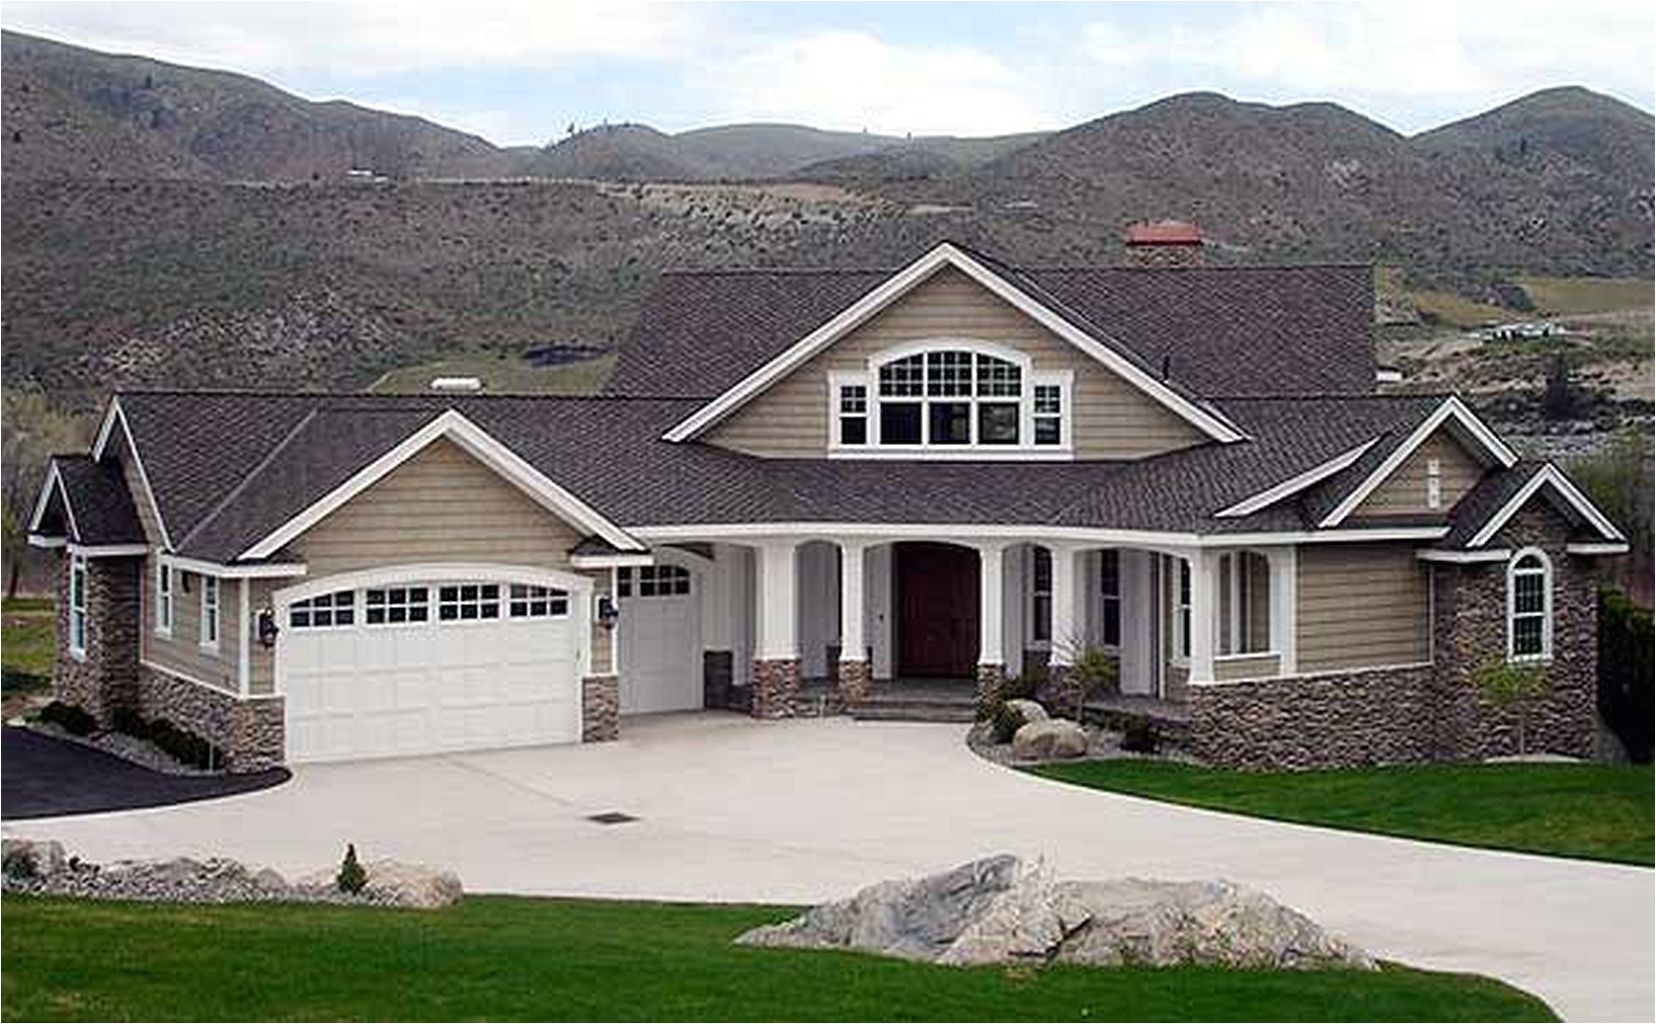 06 craftman style house 16 photo gallery 6909